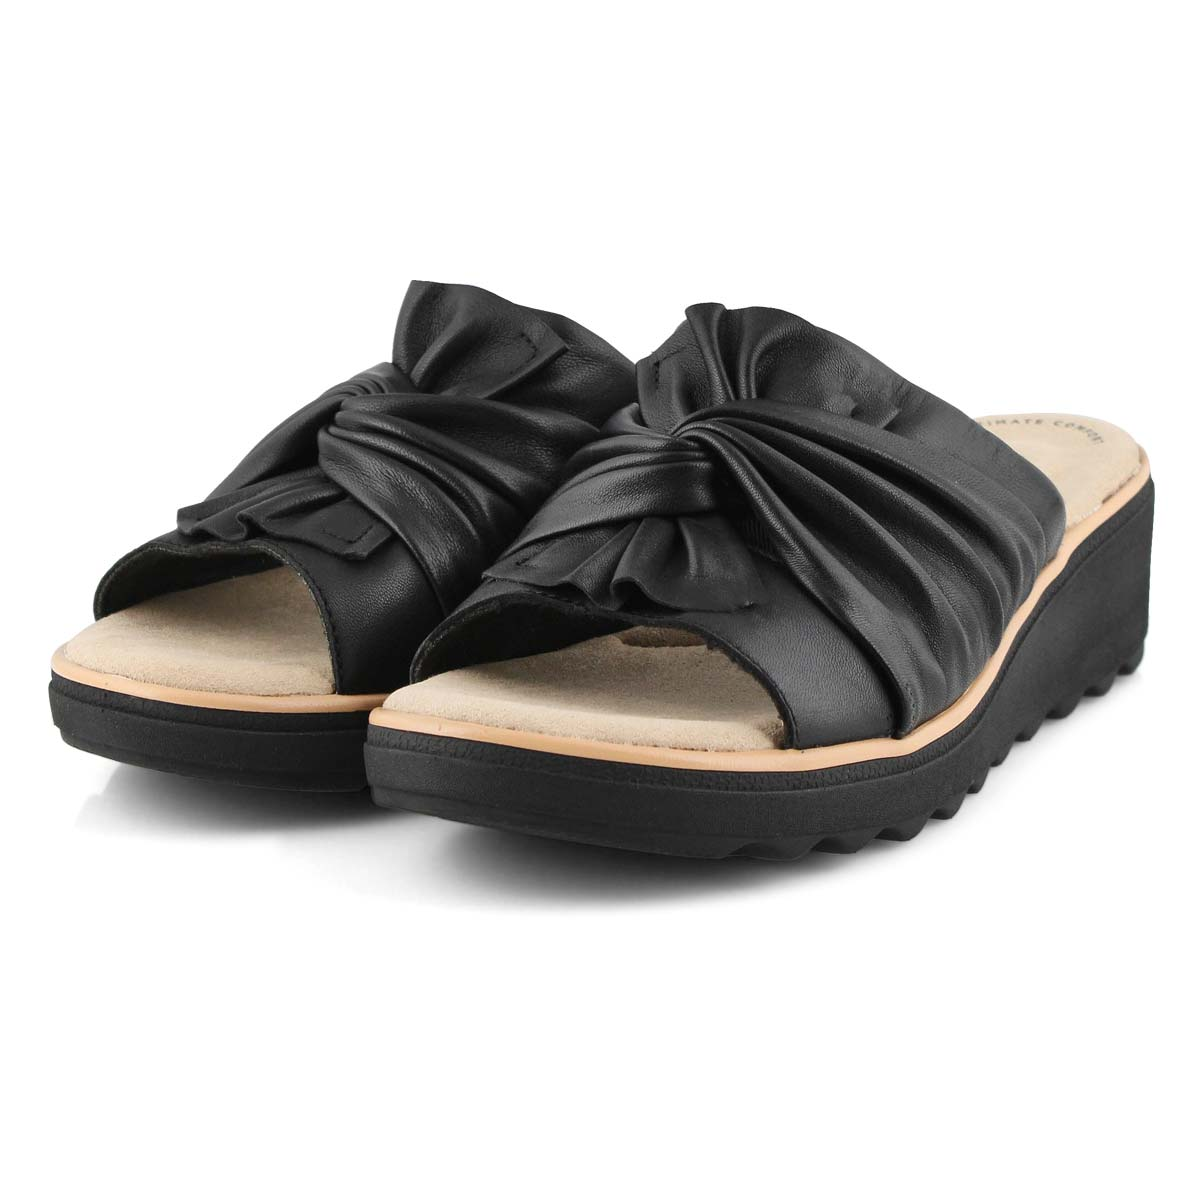 Lds Jillian Leap black wedge sandal